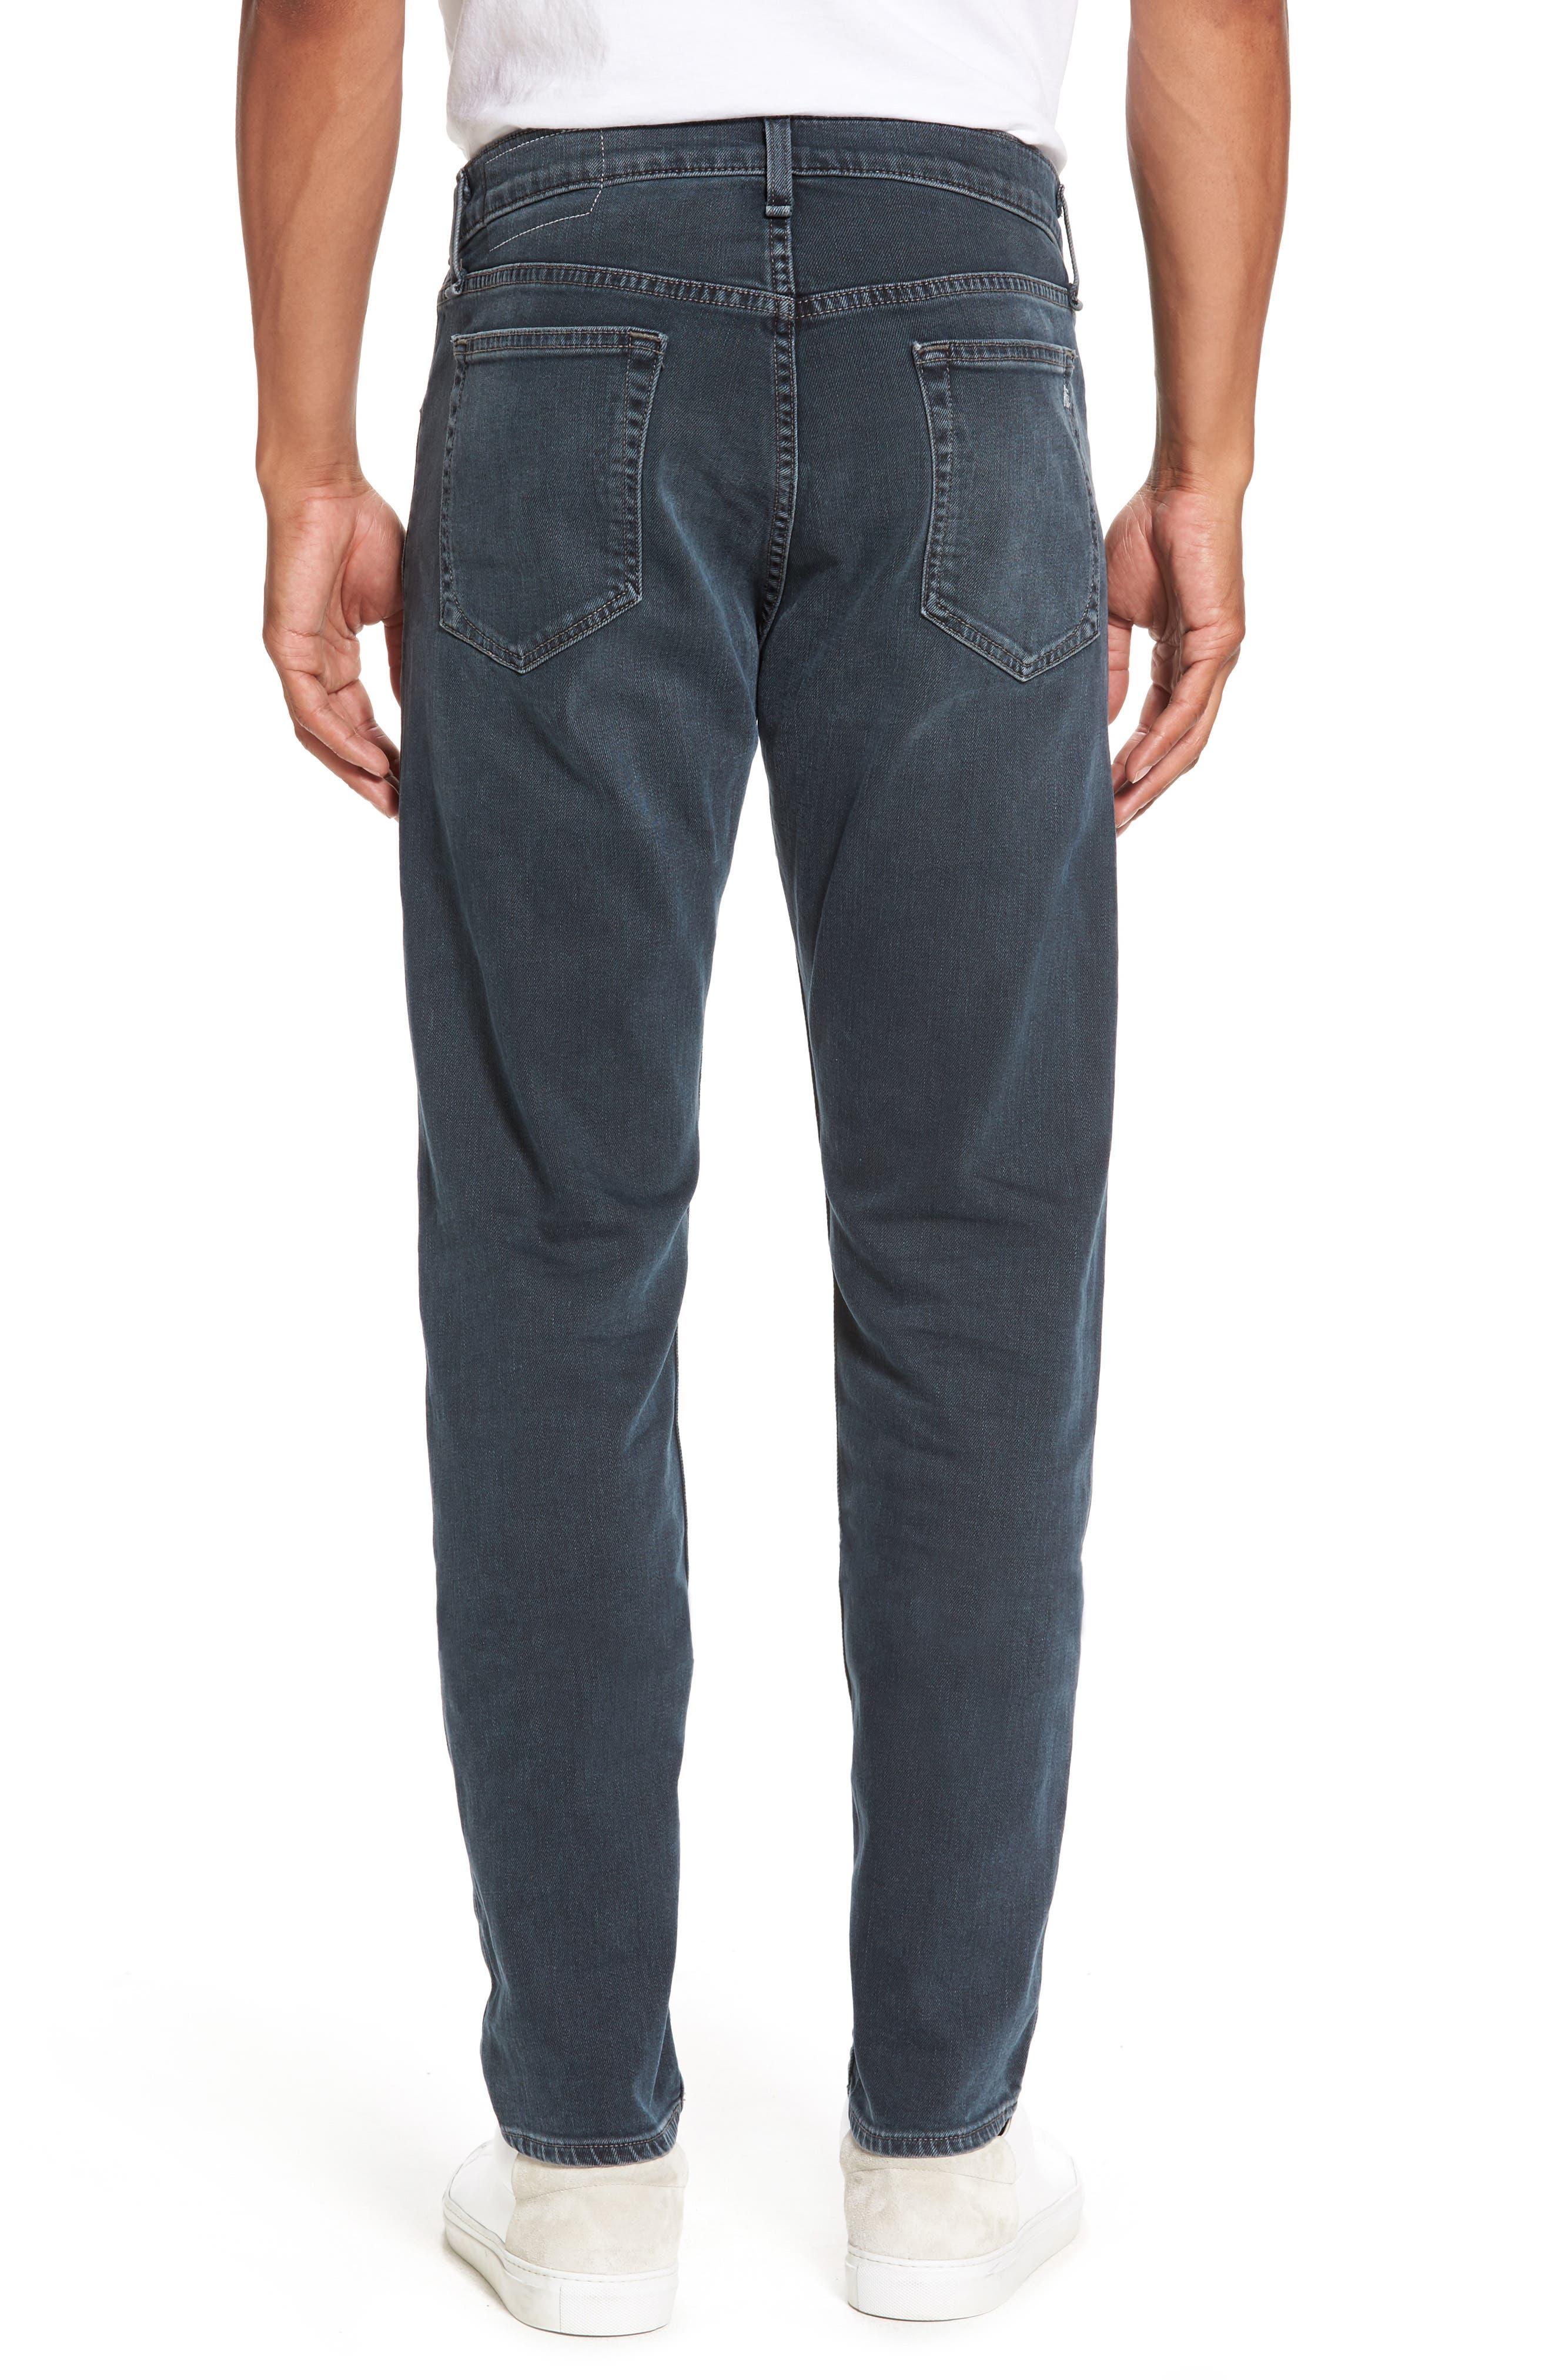 RAG & BONE, Fit 2 Slim Fit Jeans, Alternate thumbnail 2, color, MINNA